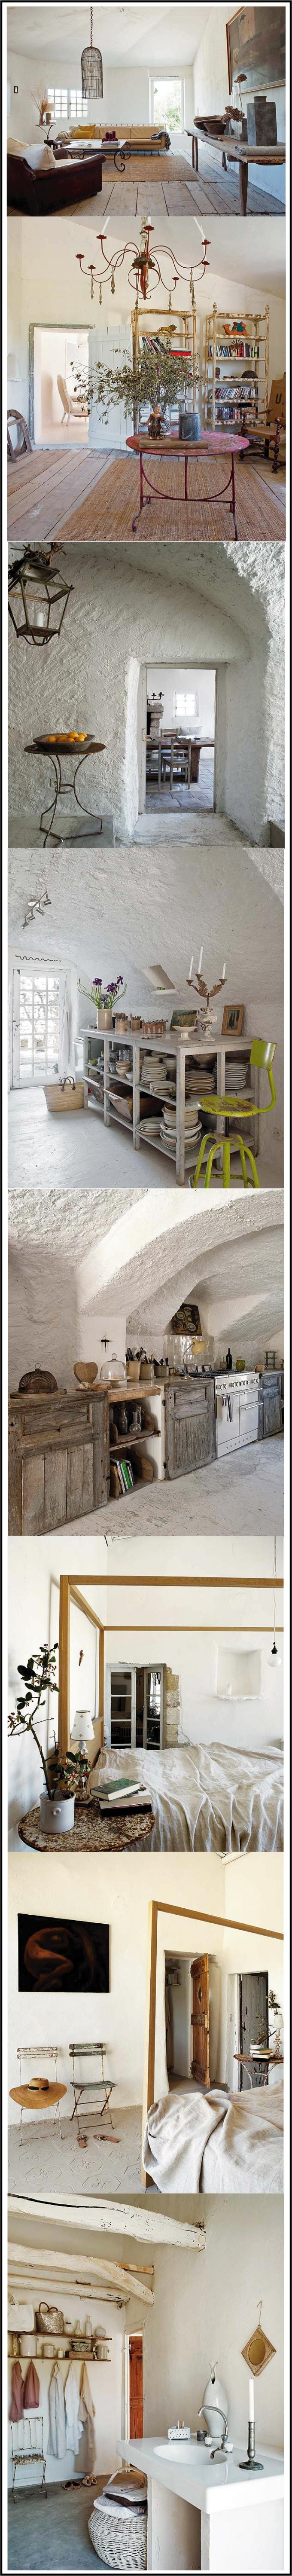 une maison rurale chic blanche par chiara stella home